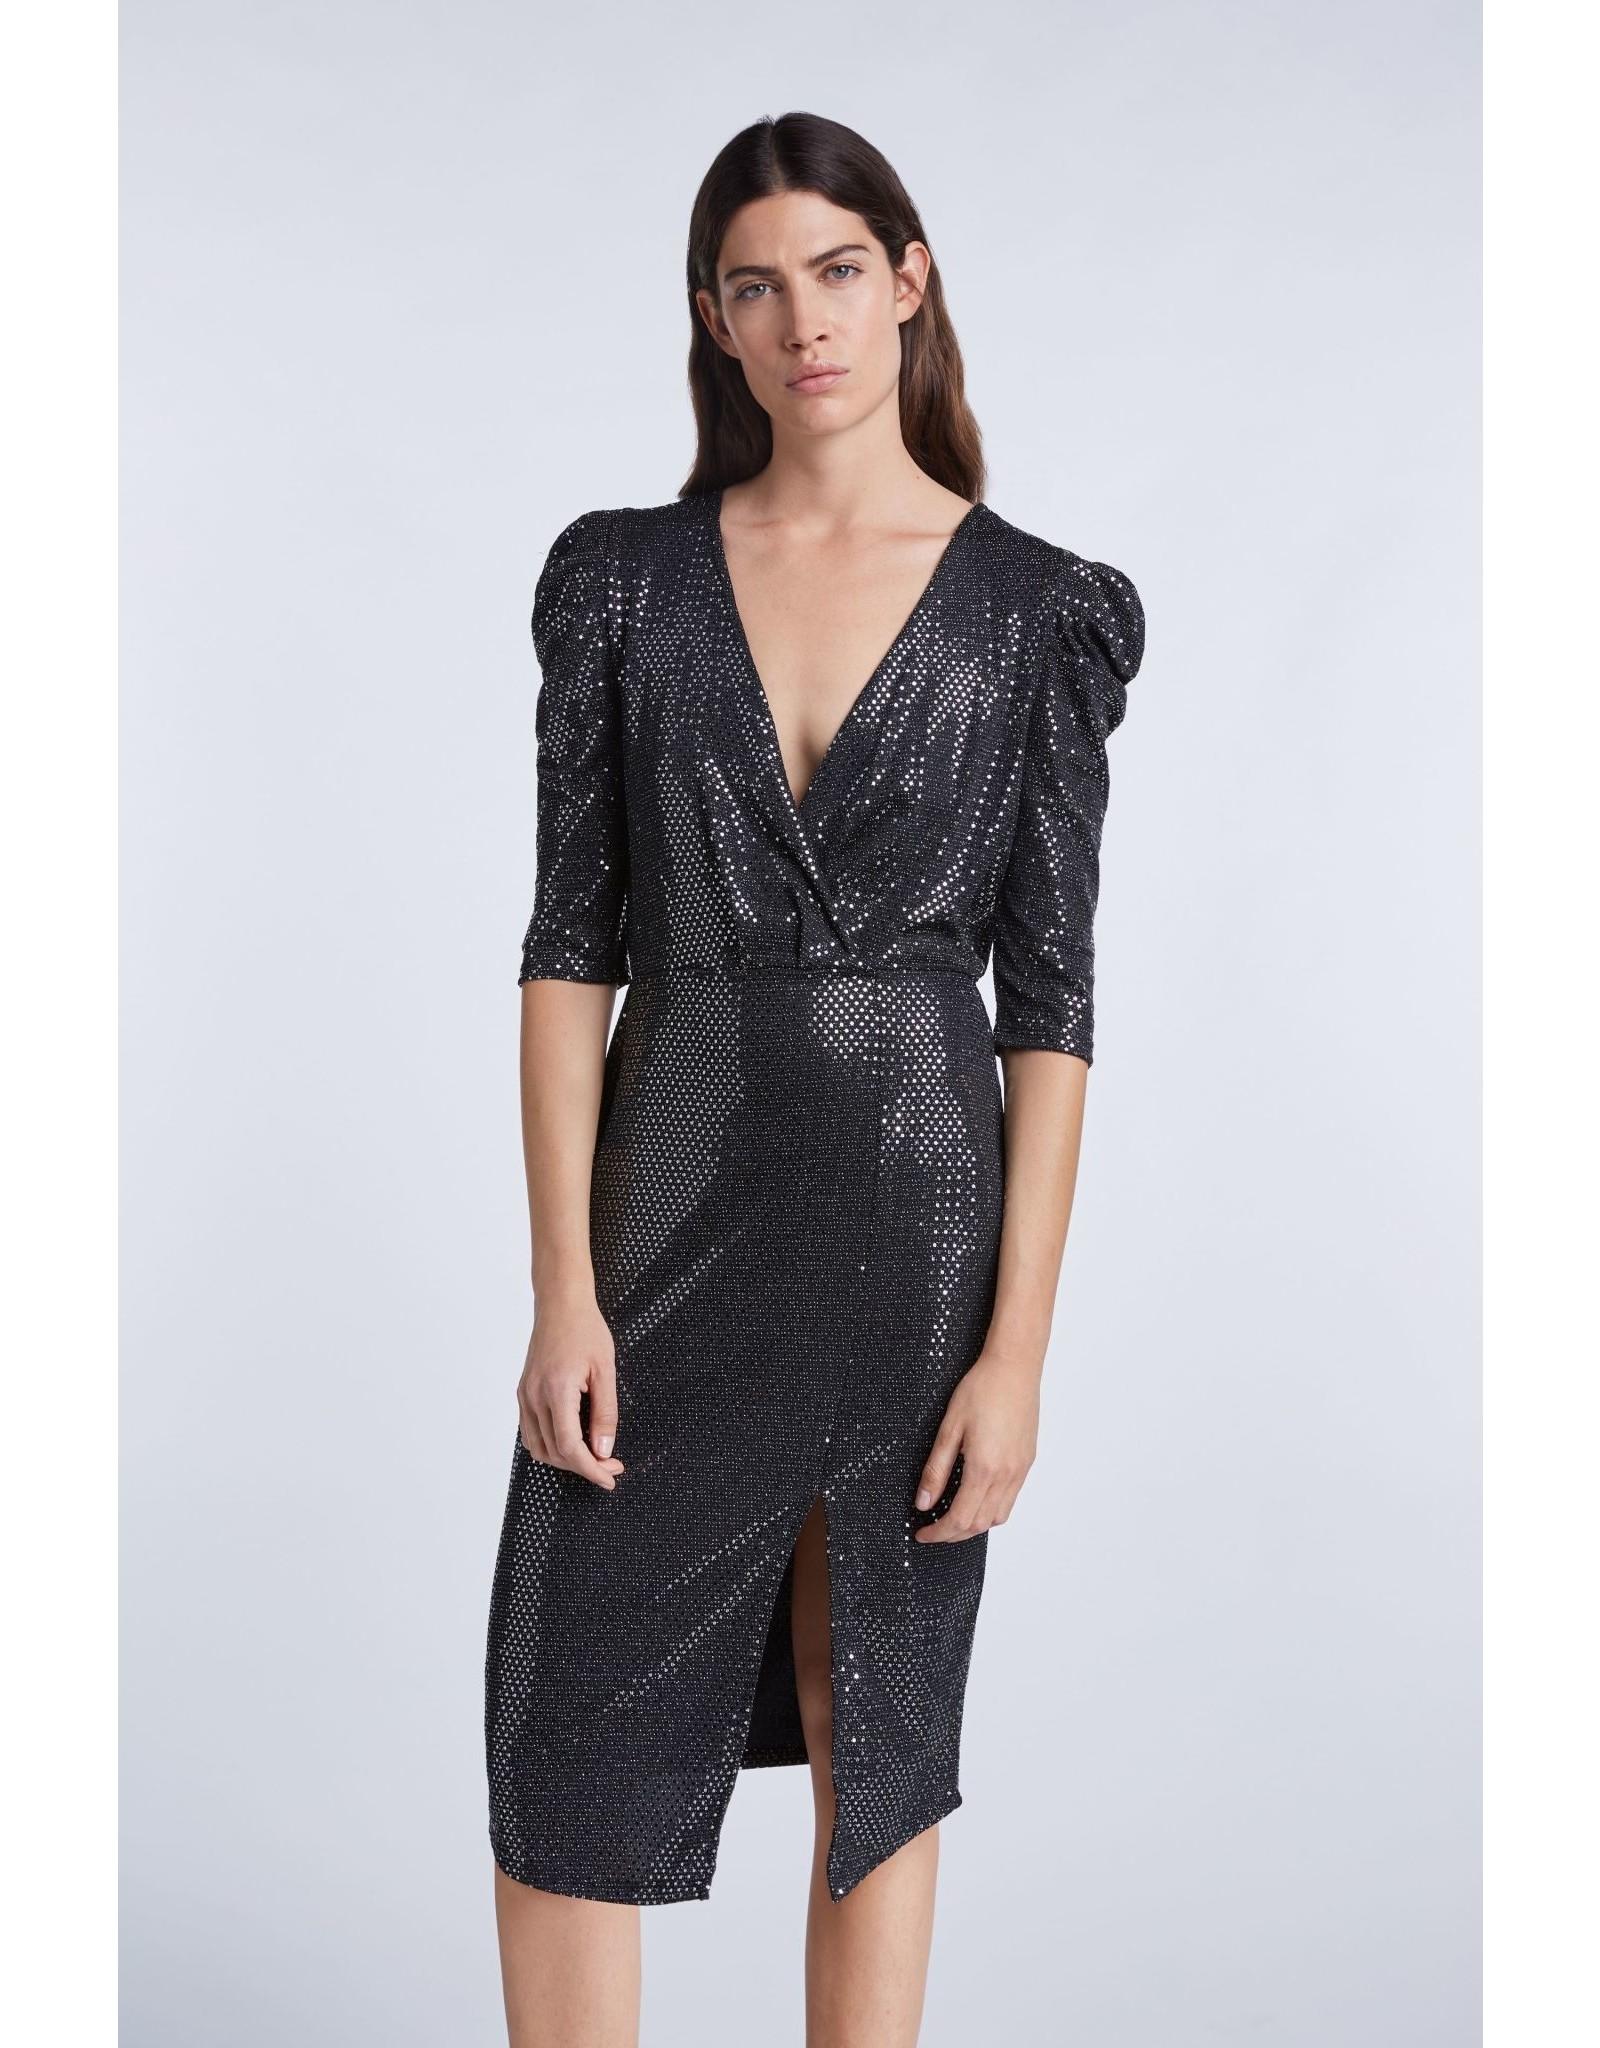 SET Fabulous metallic sequin evening dress